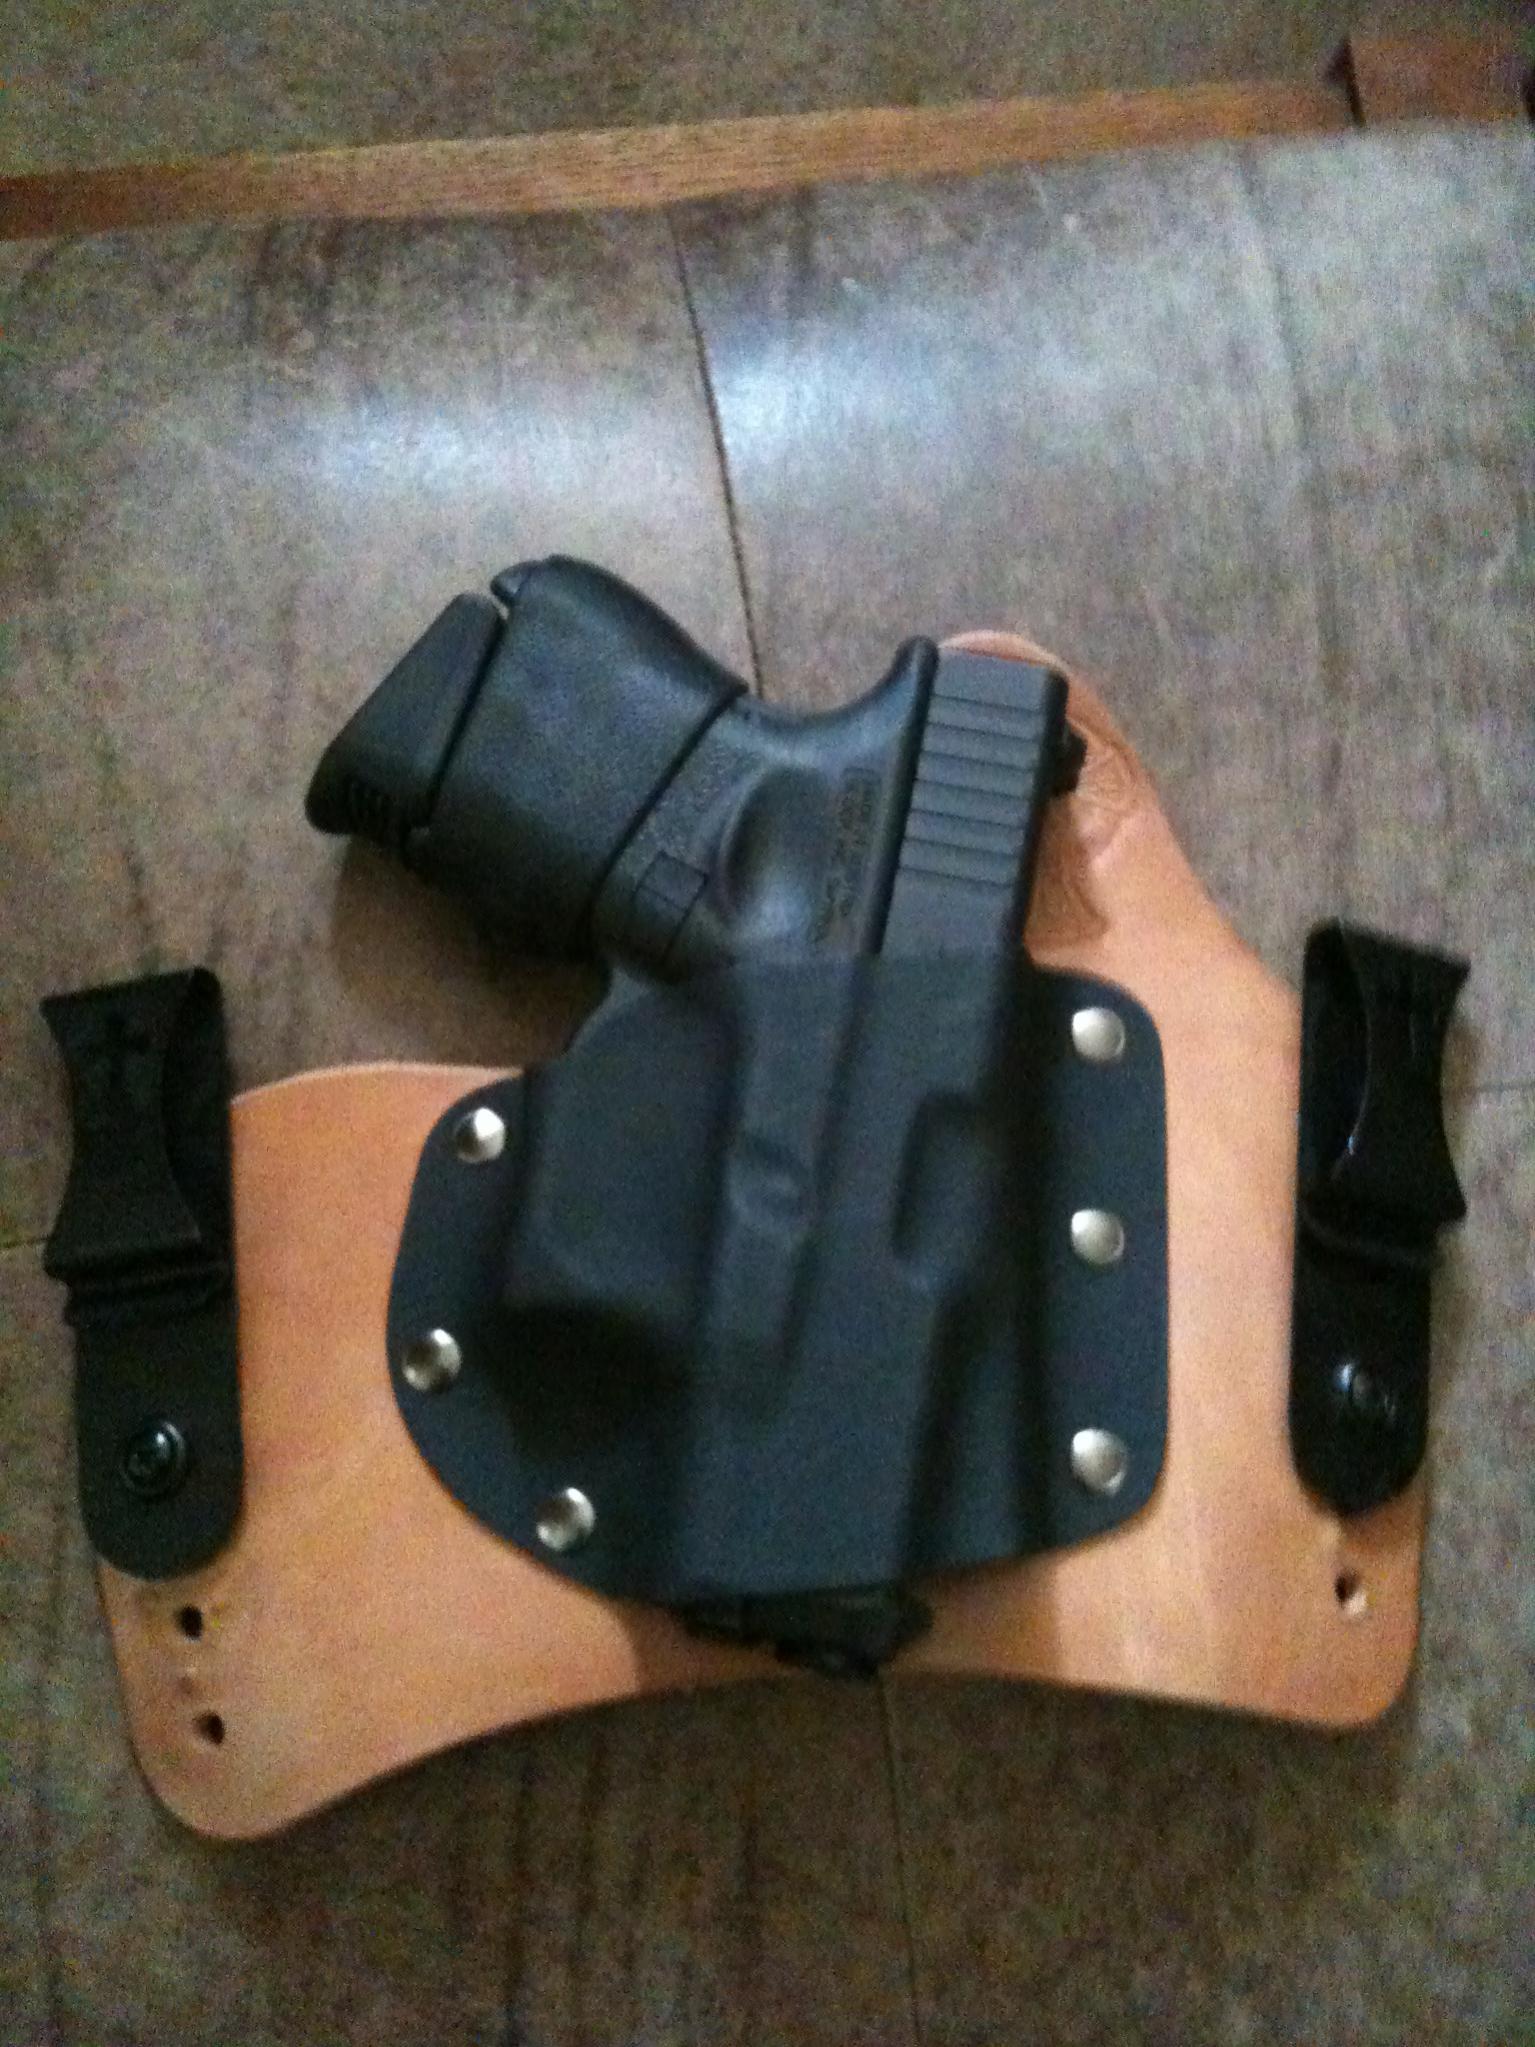 Any pics Glock 27 holster setup?-img_0003.jpg